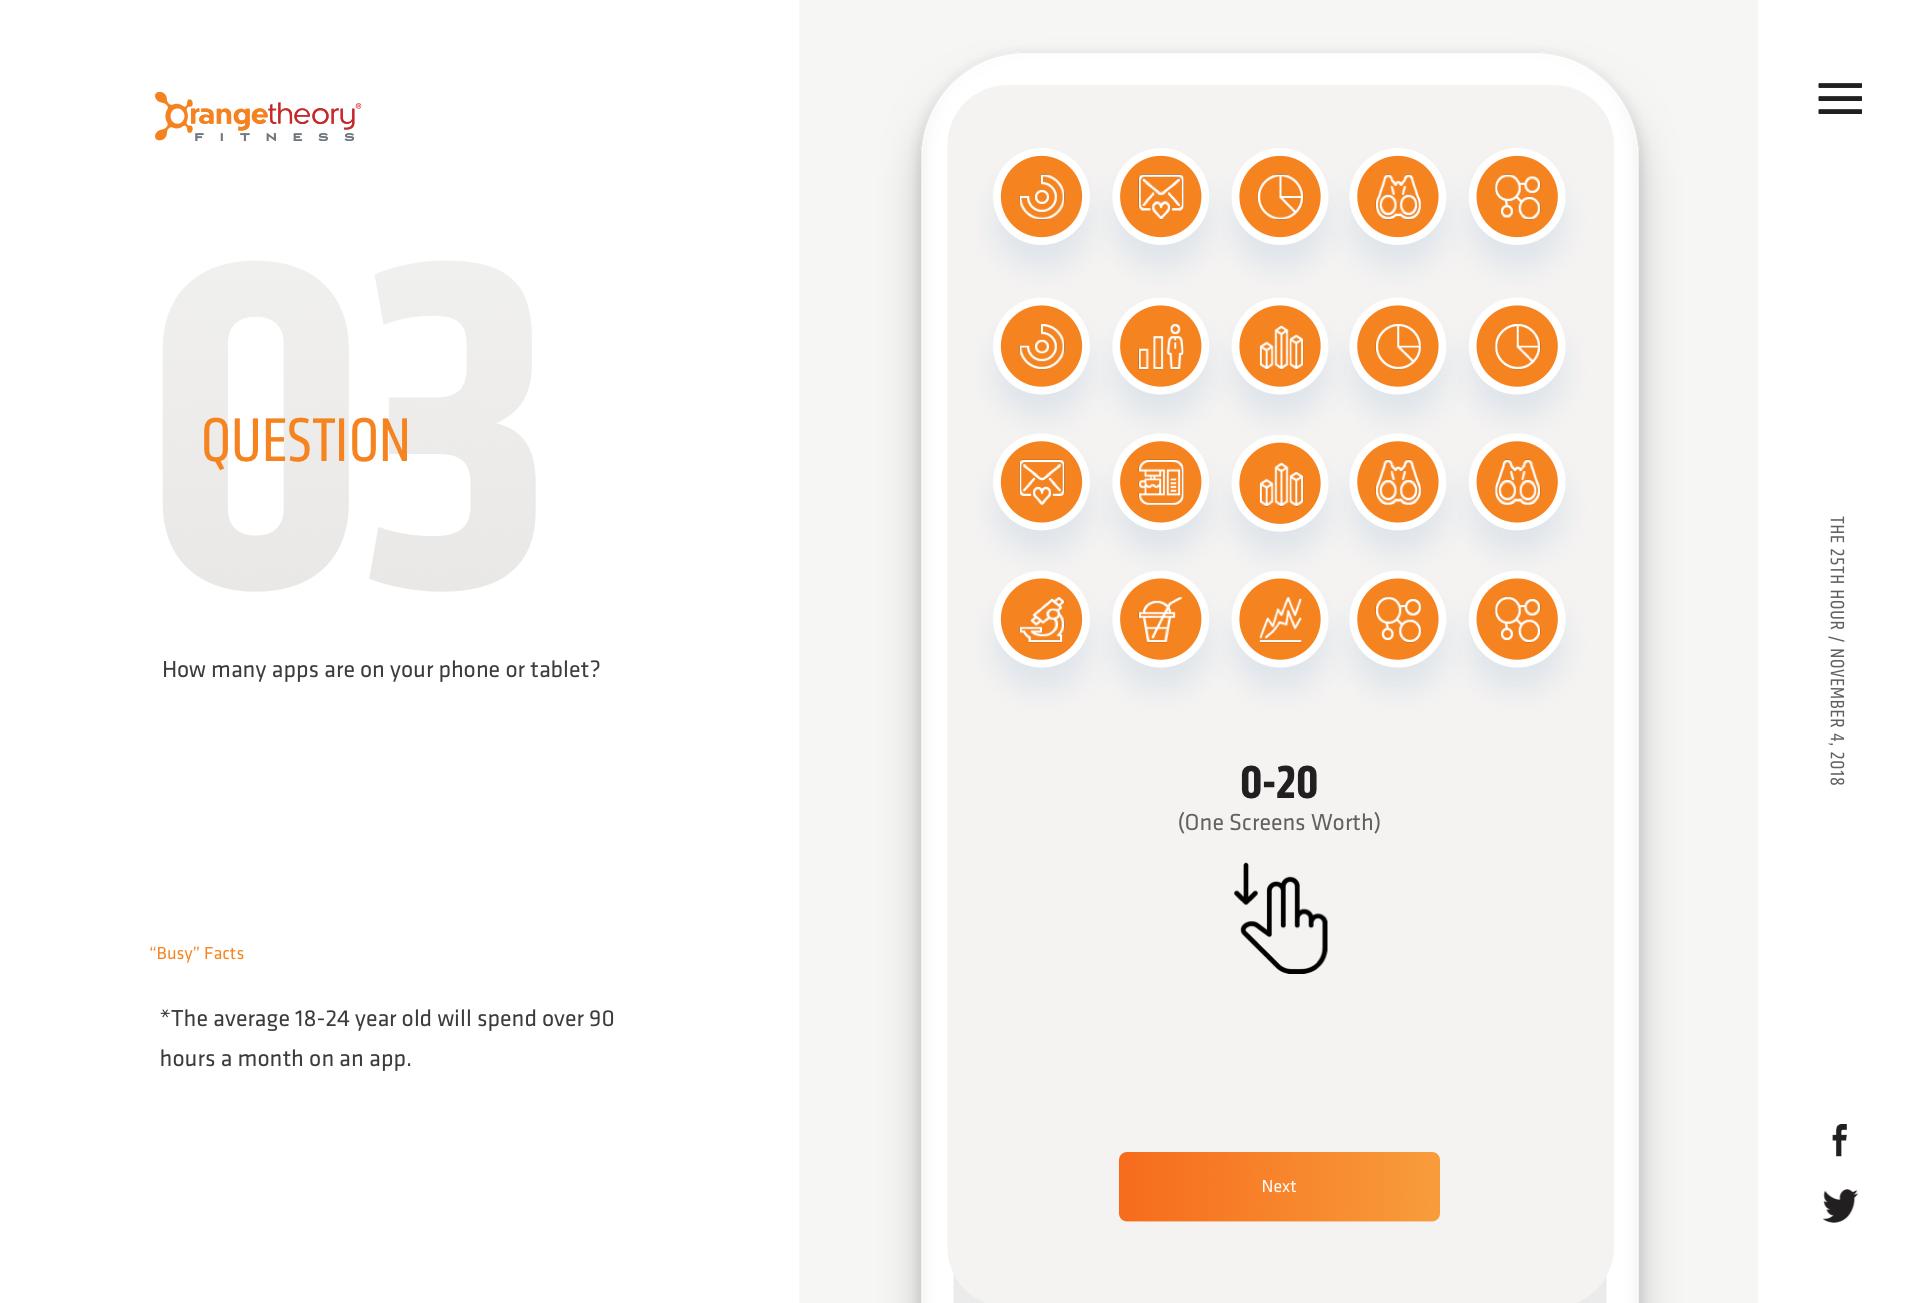 Quiz 3: Slide Interaction